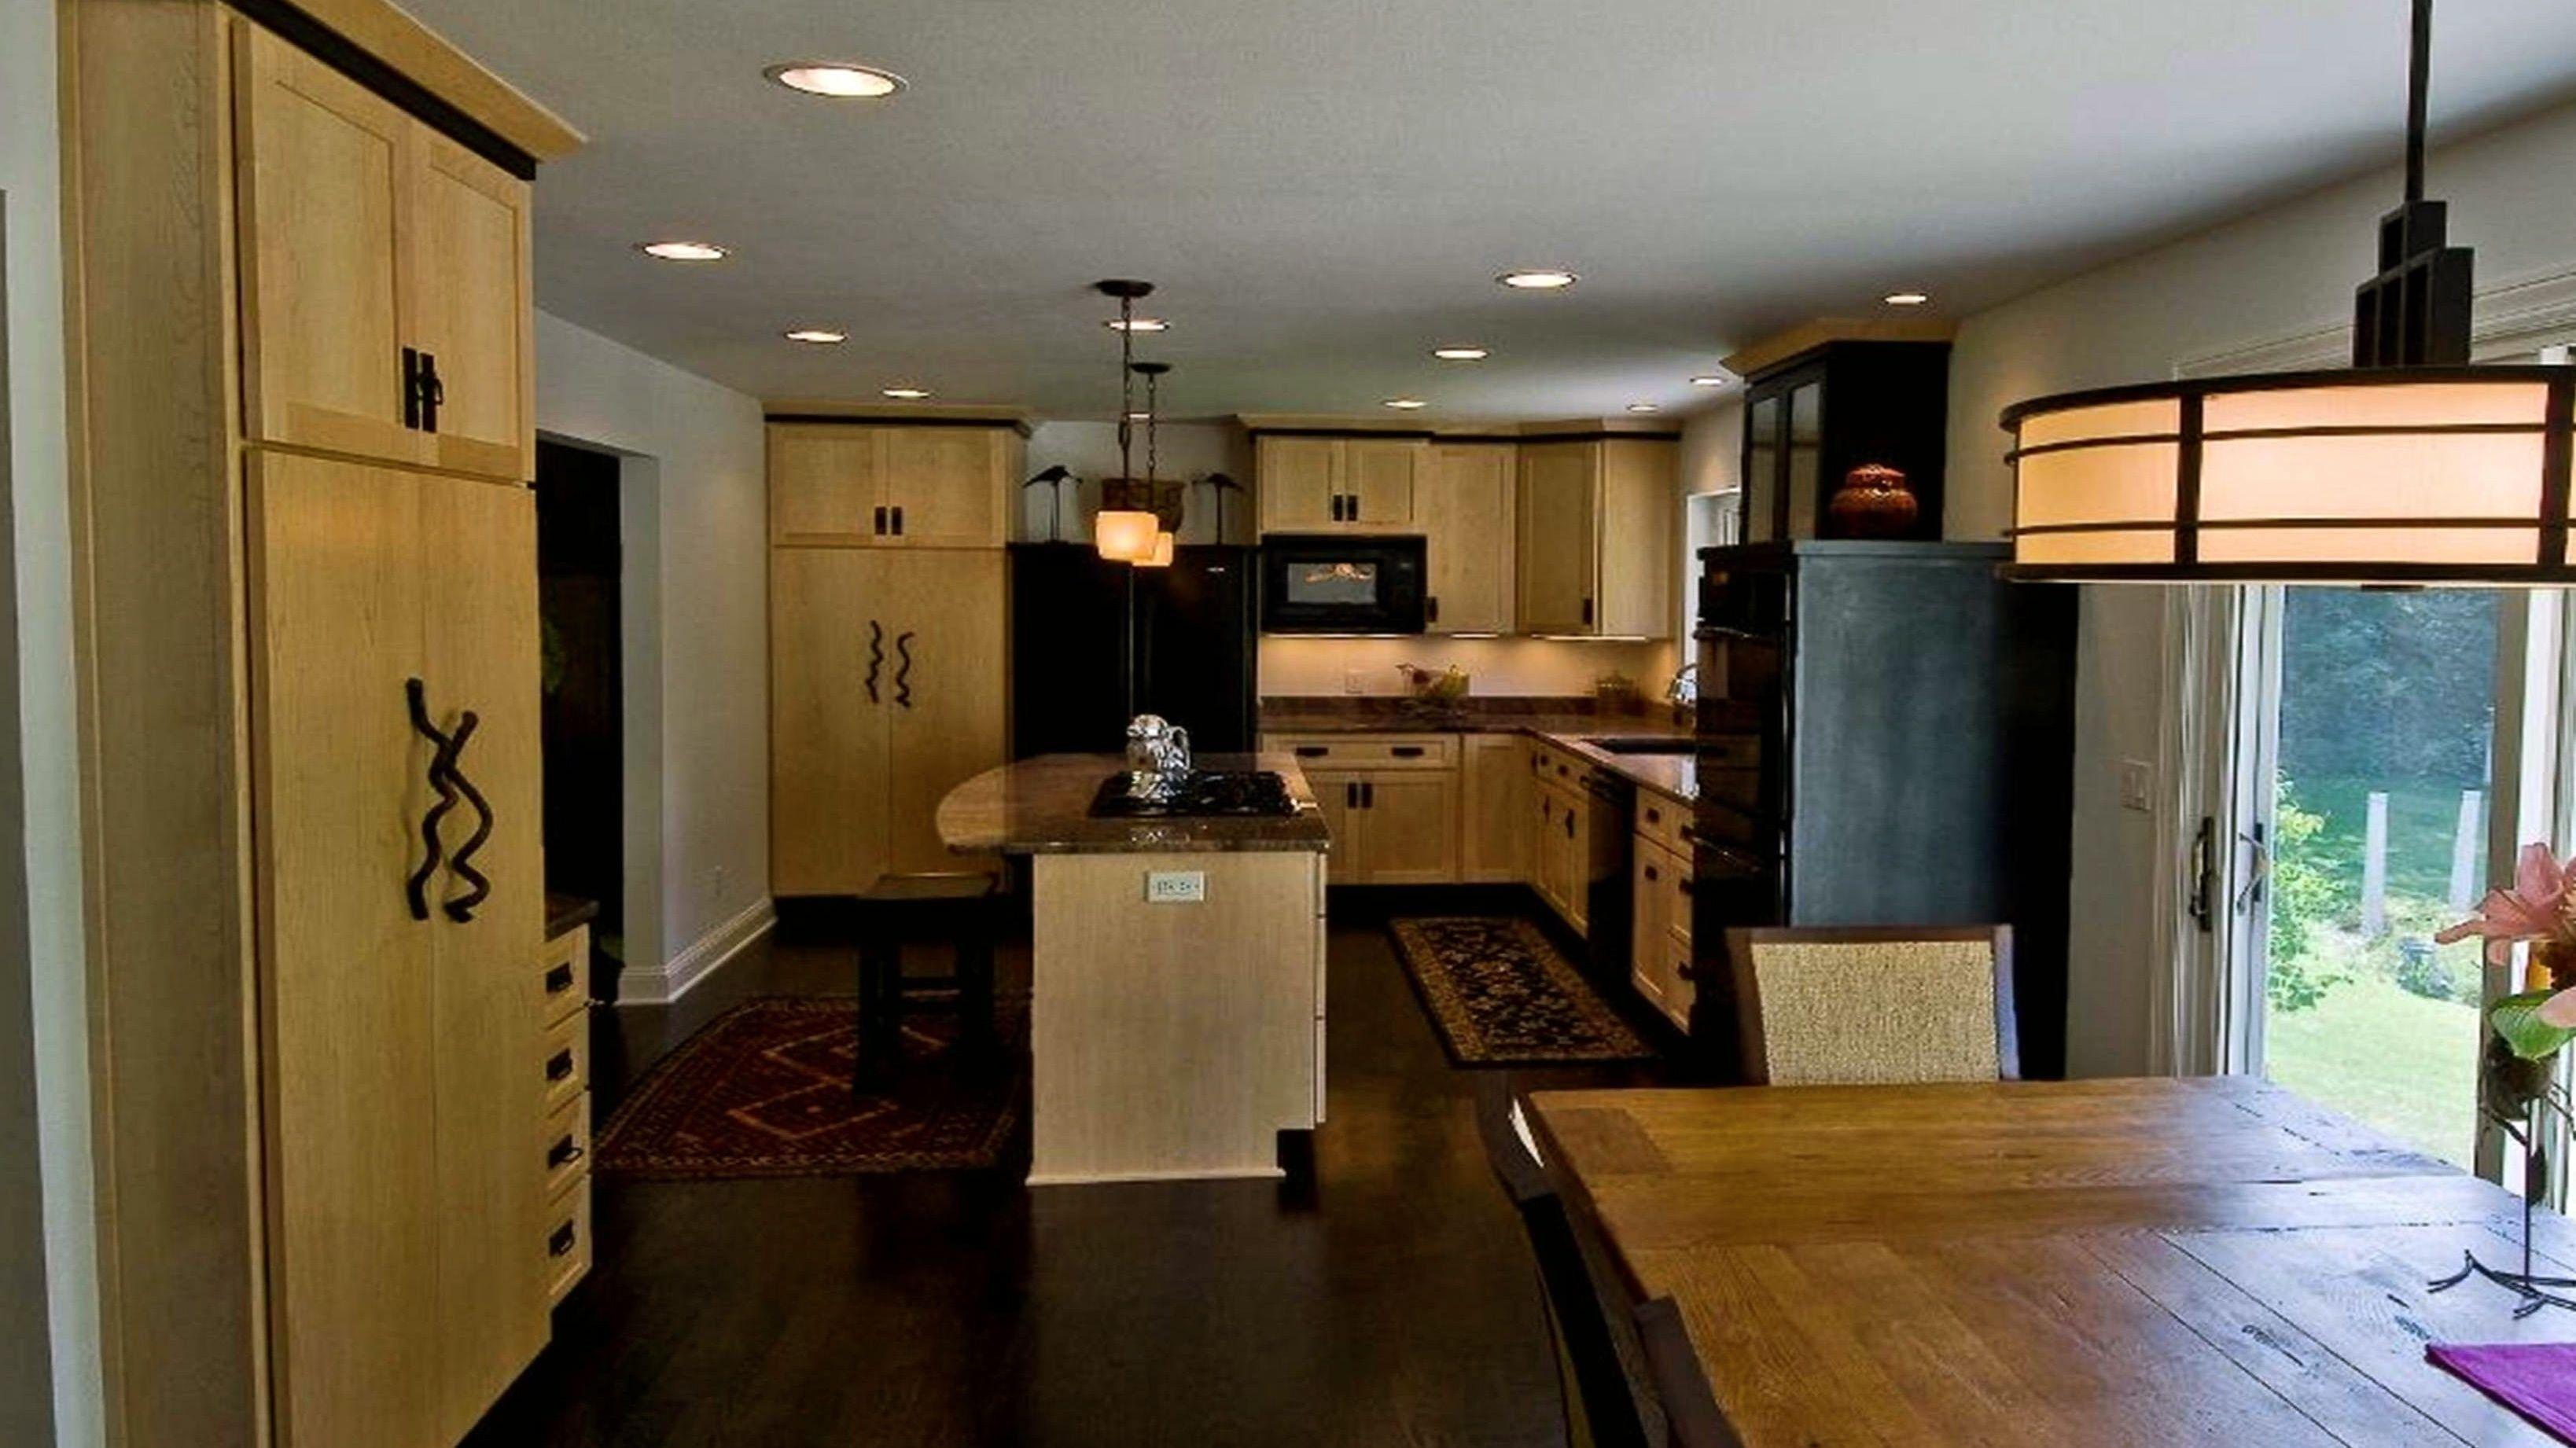 Walnut floors, maple cabinets, dark countertops, soft ... on Maple Kitchen Cabinets With Dark Wood Floors Dark Countertops  id=97381